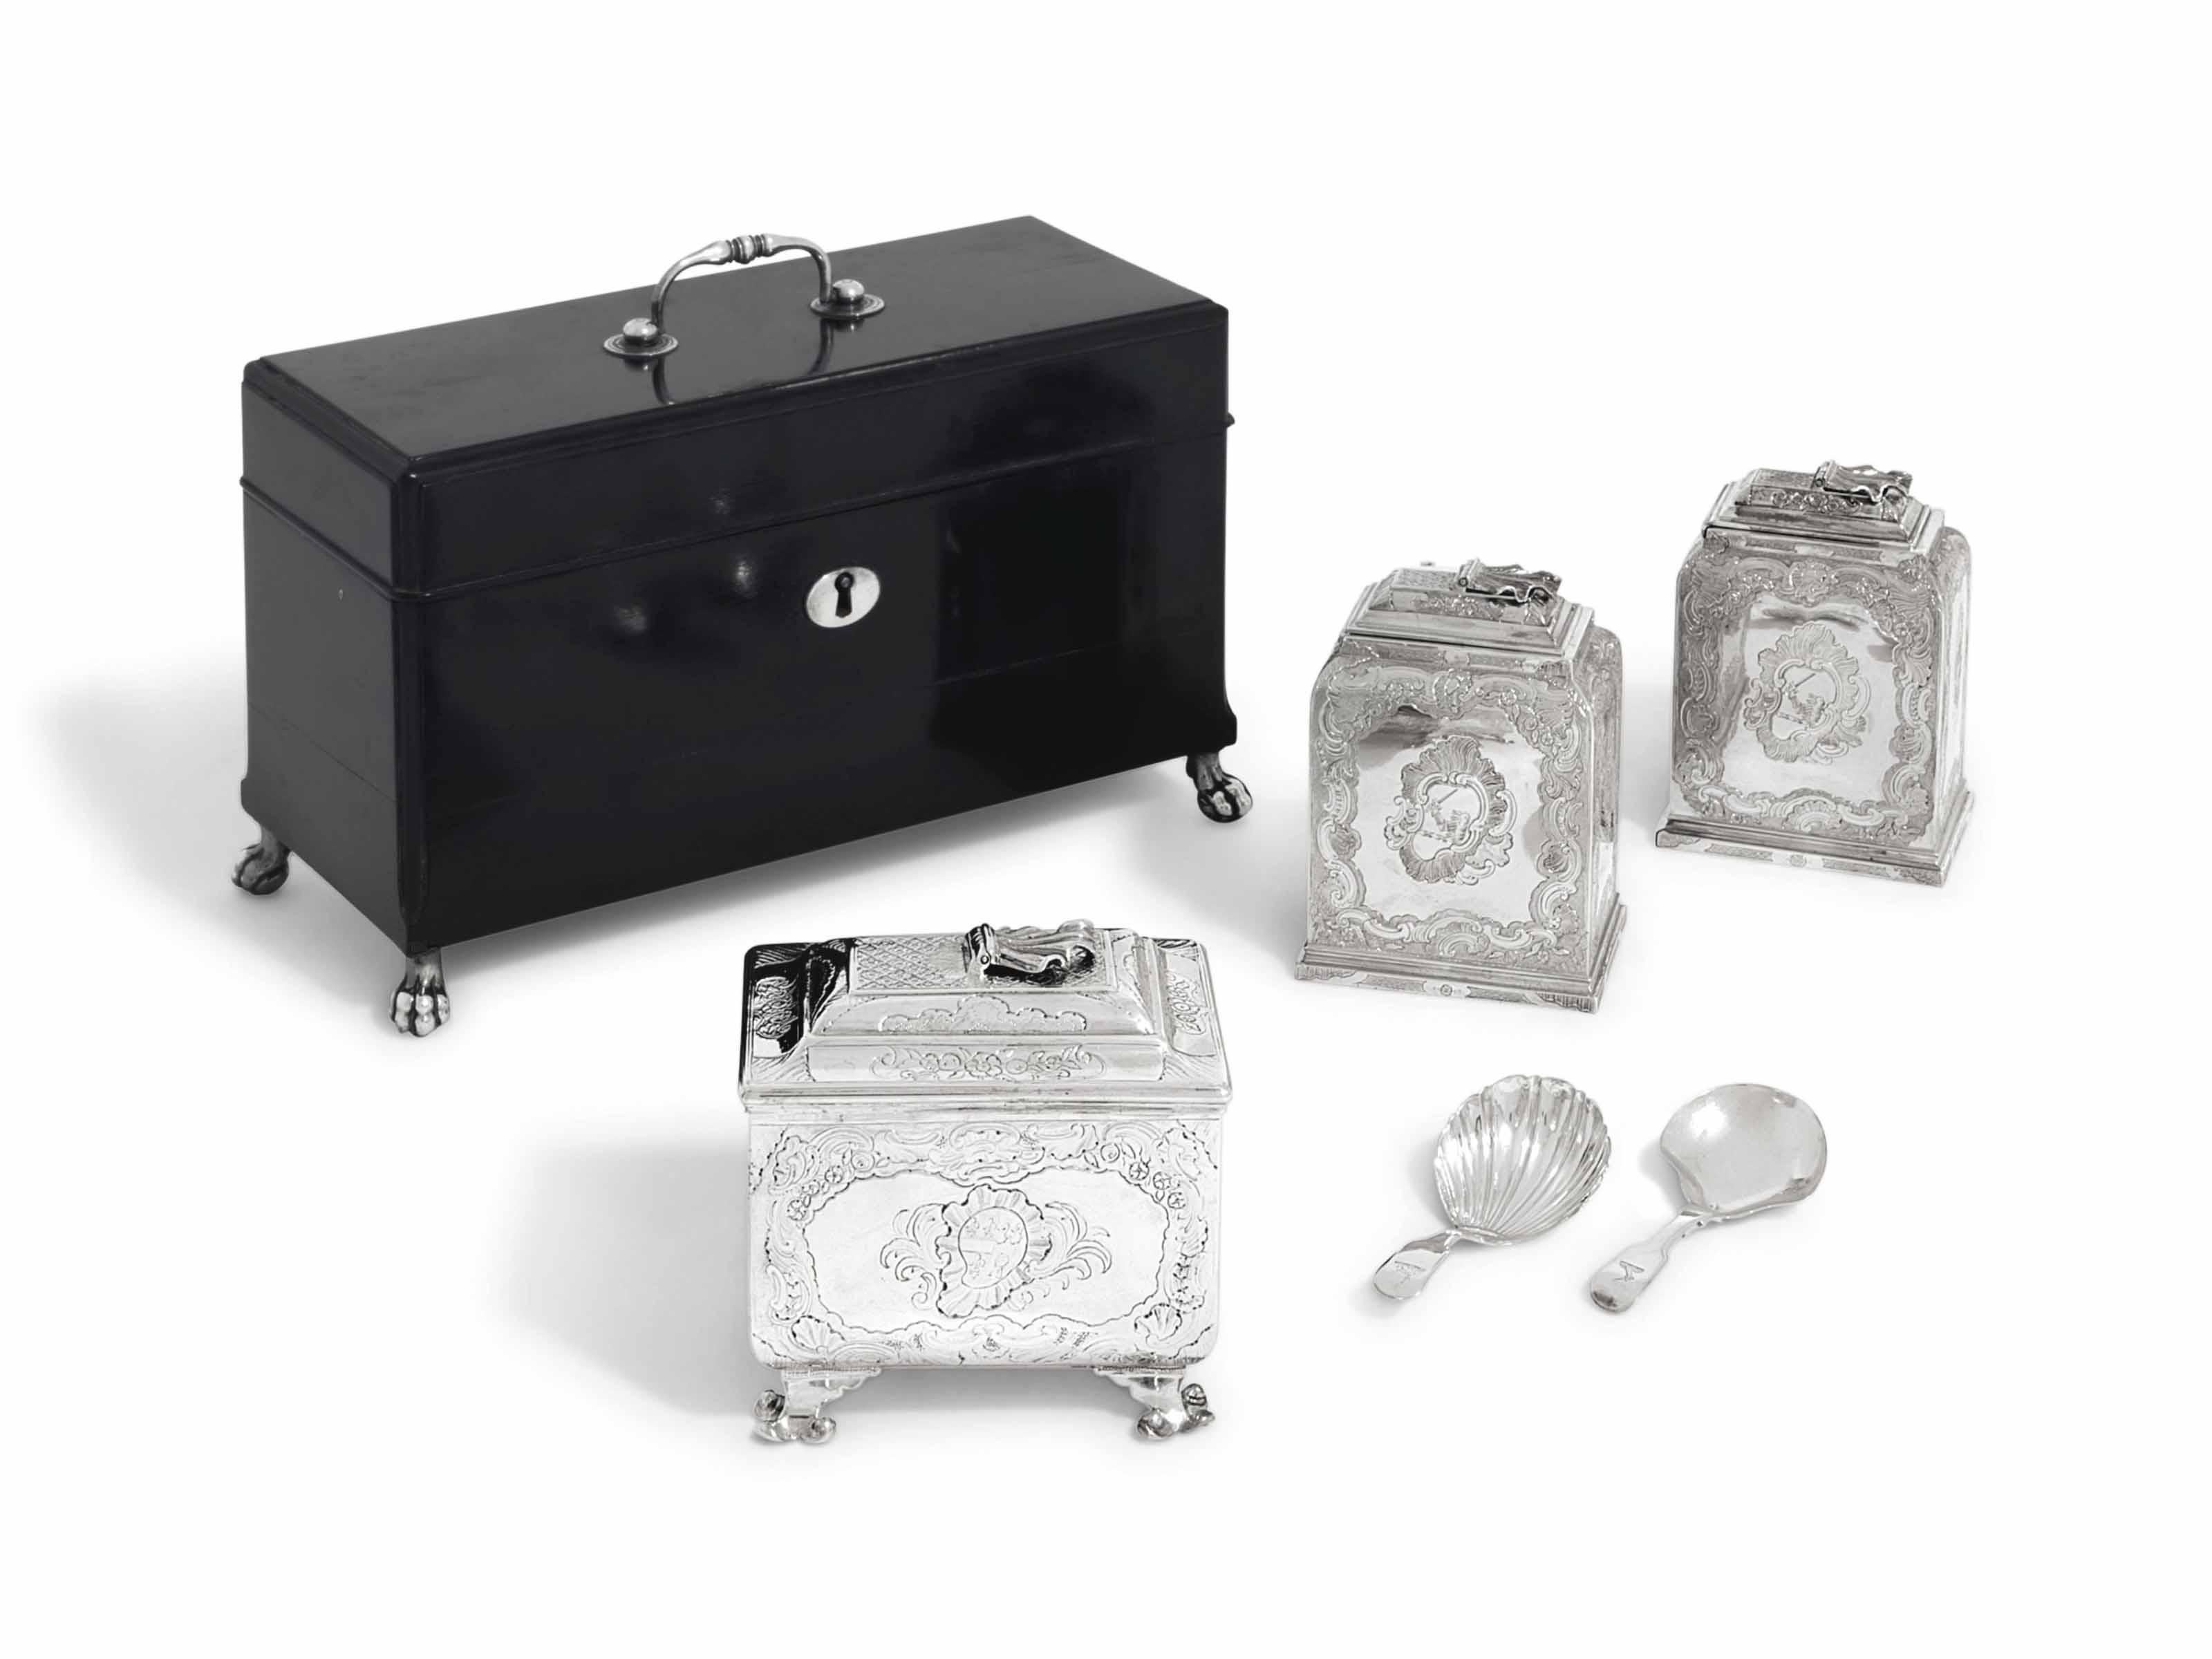 A PAIR OF GEORGE II SILVER TEA-CADDIES AND A SUGAR-BOX EN SUITE